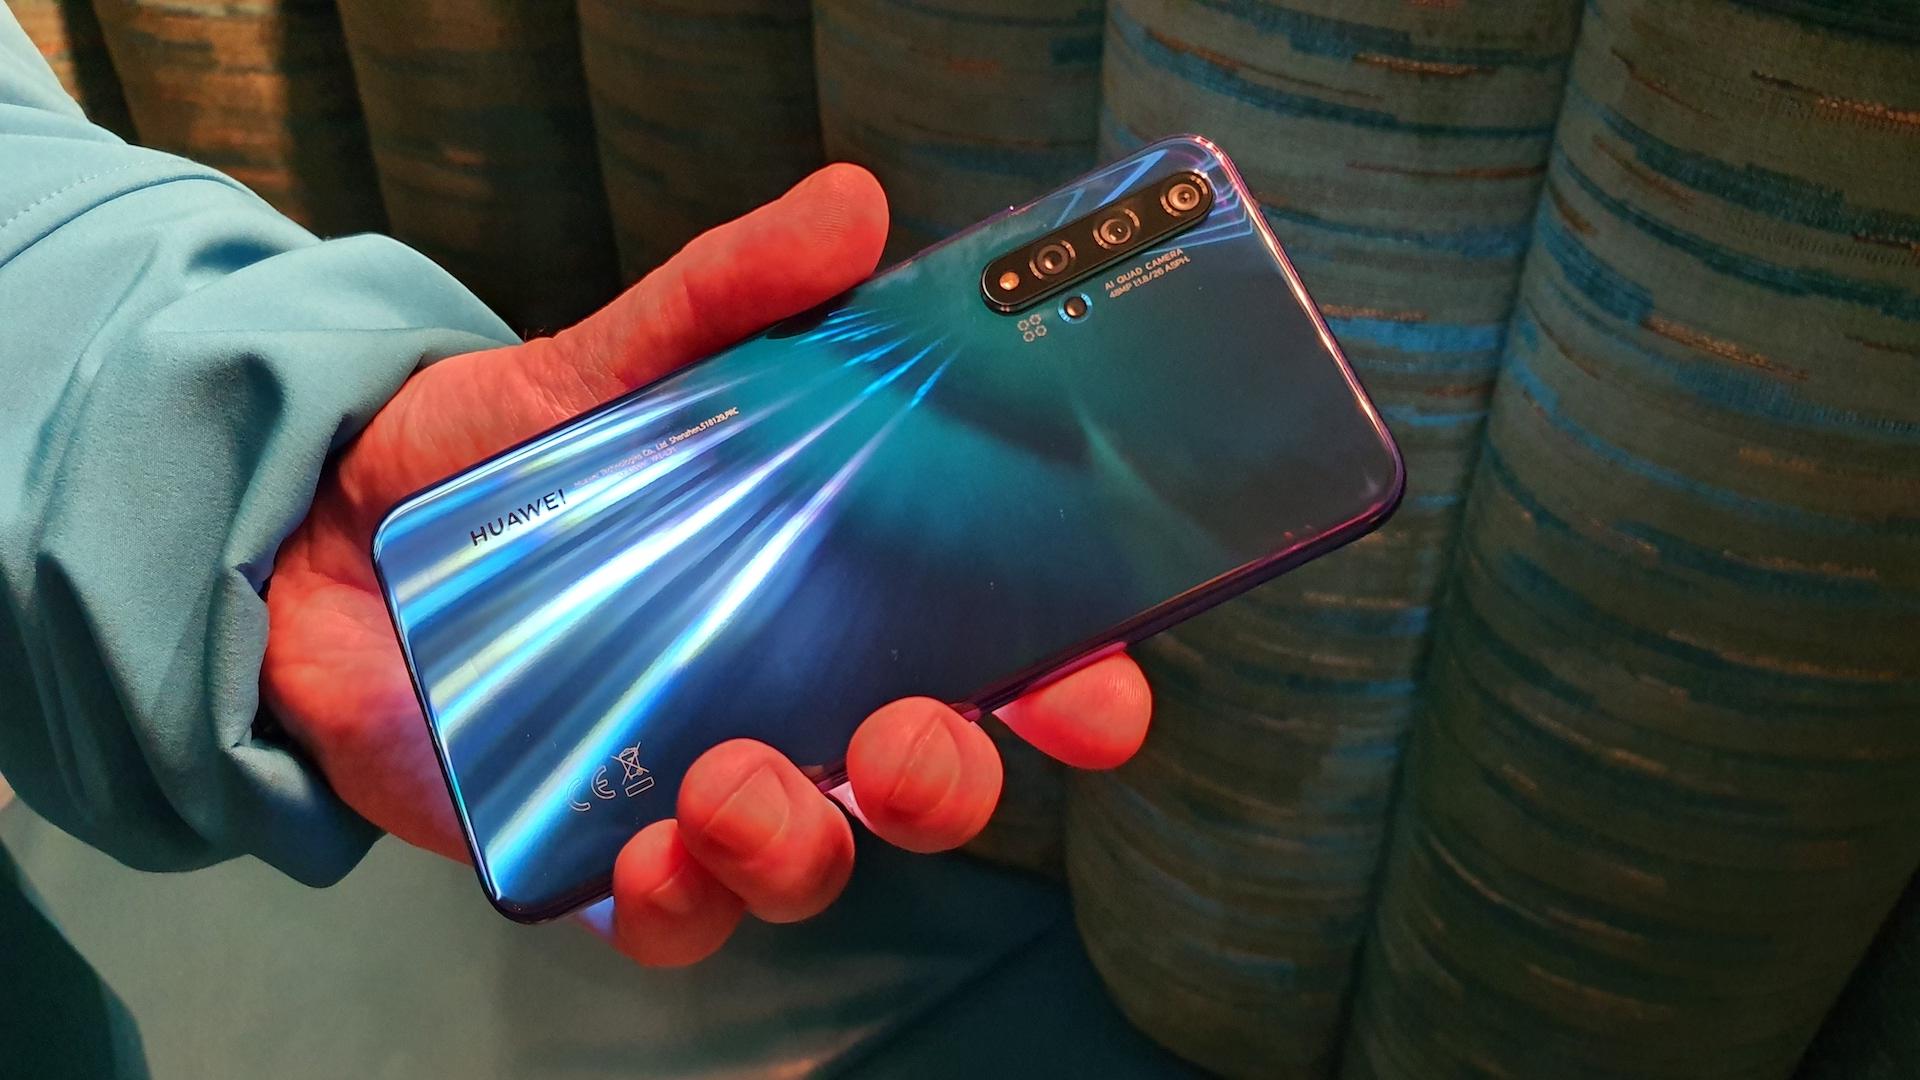 Samsung Galaxy S5 – Vandtæt præstationsmonster!